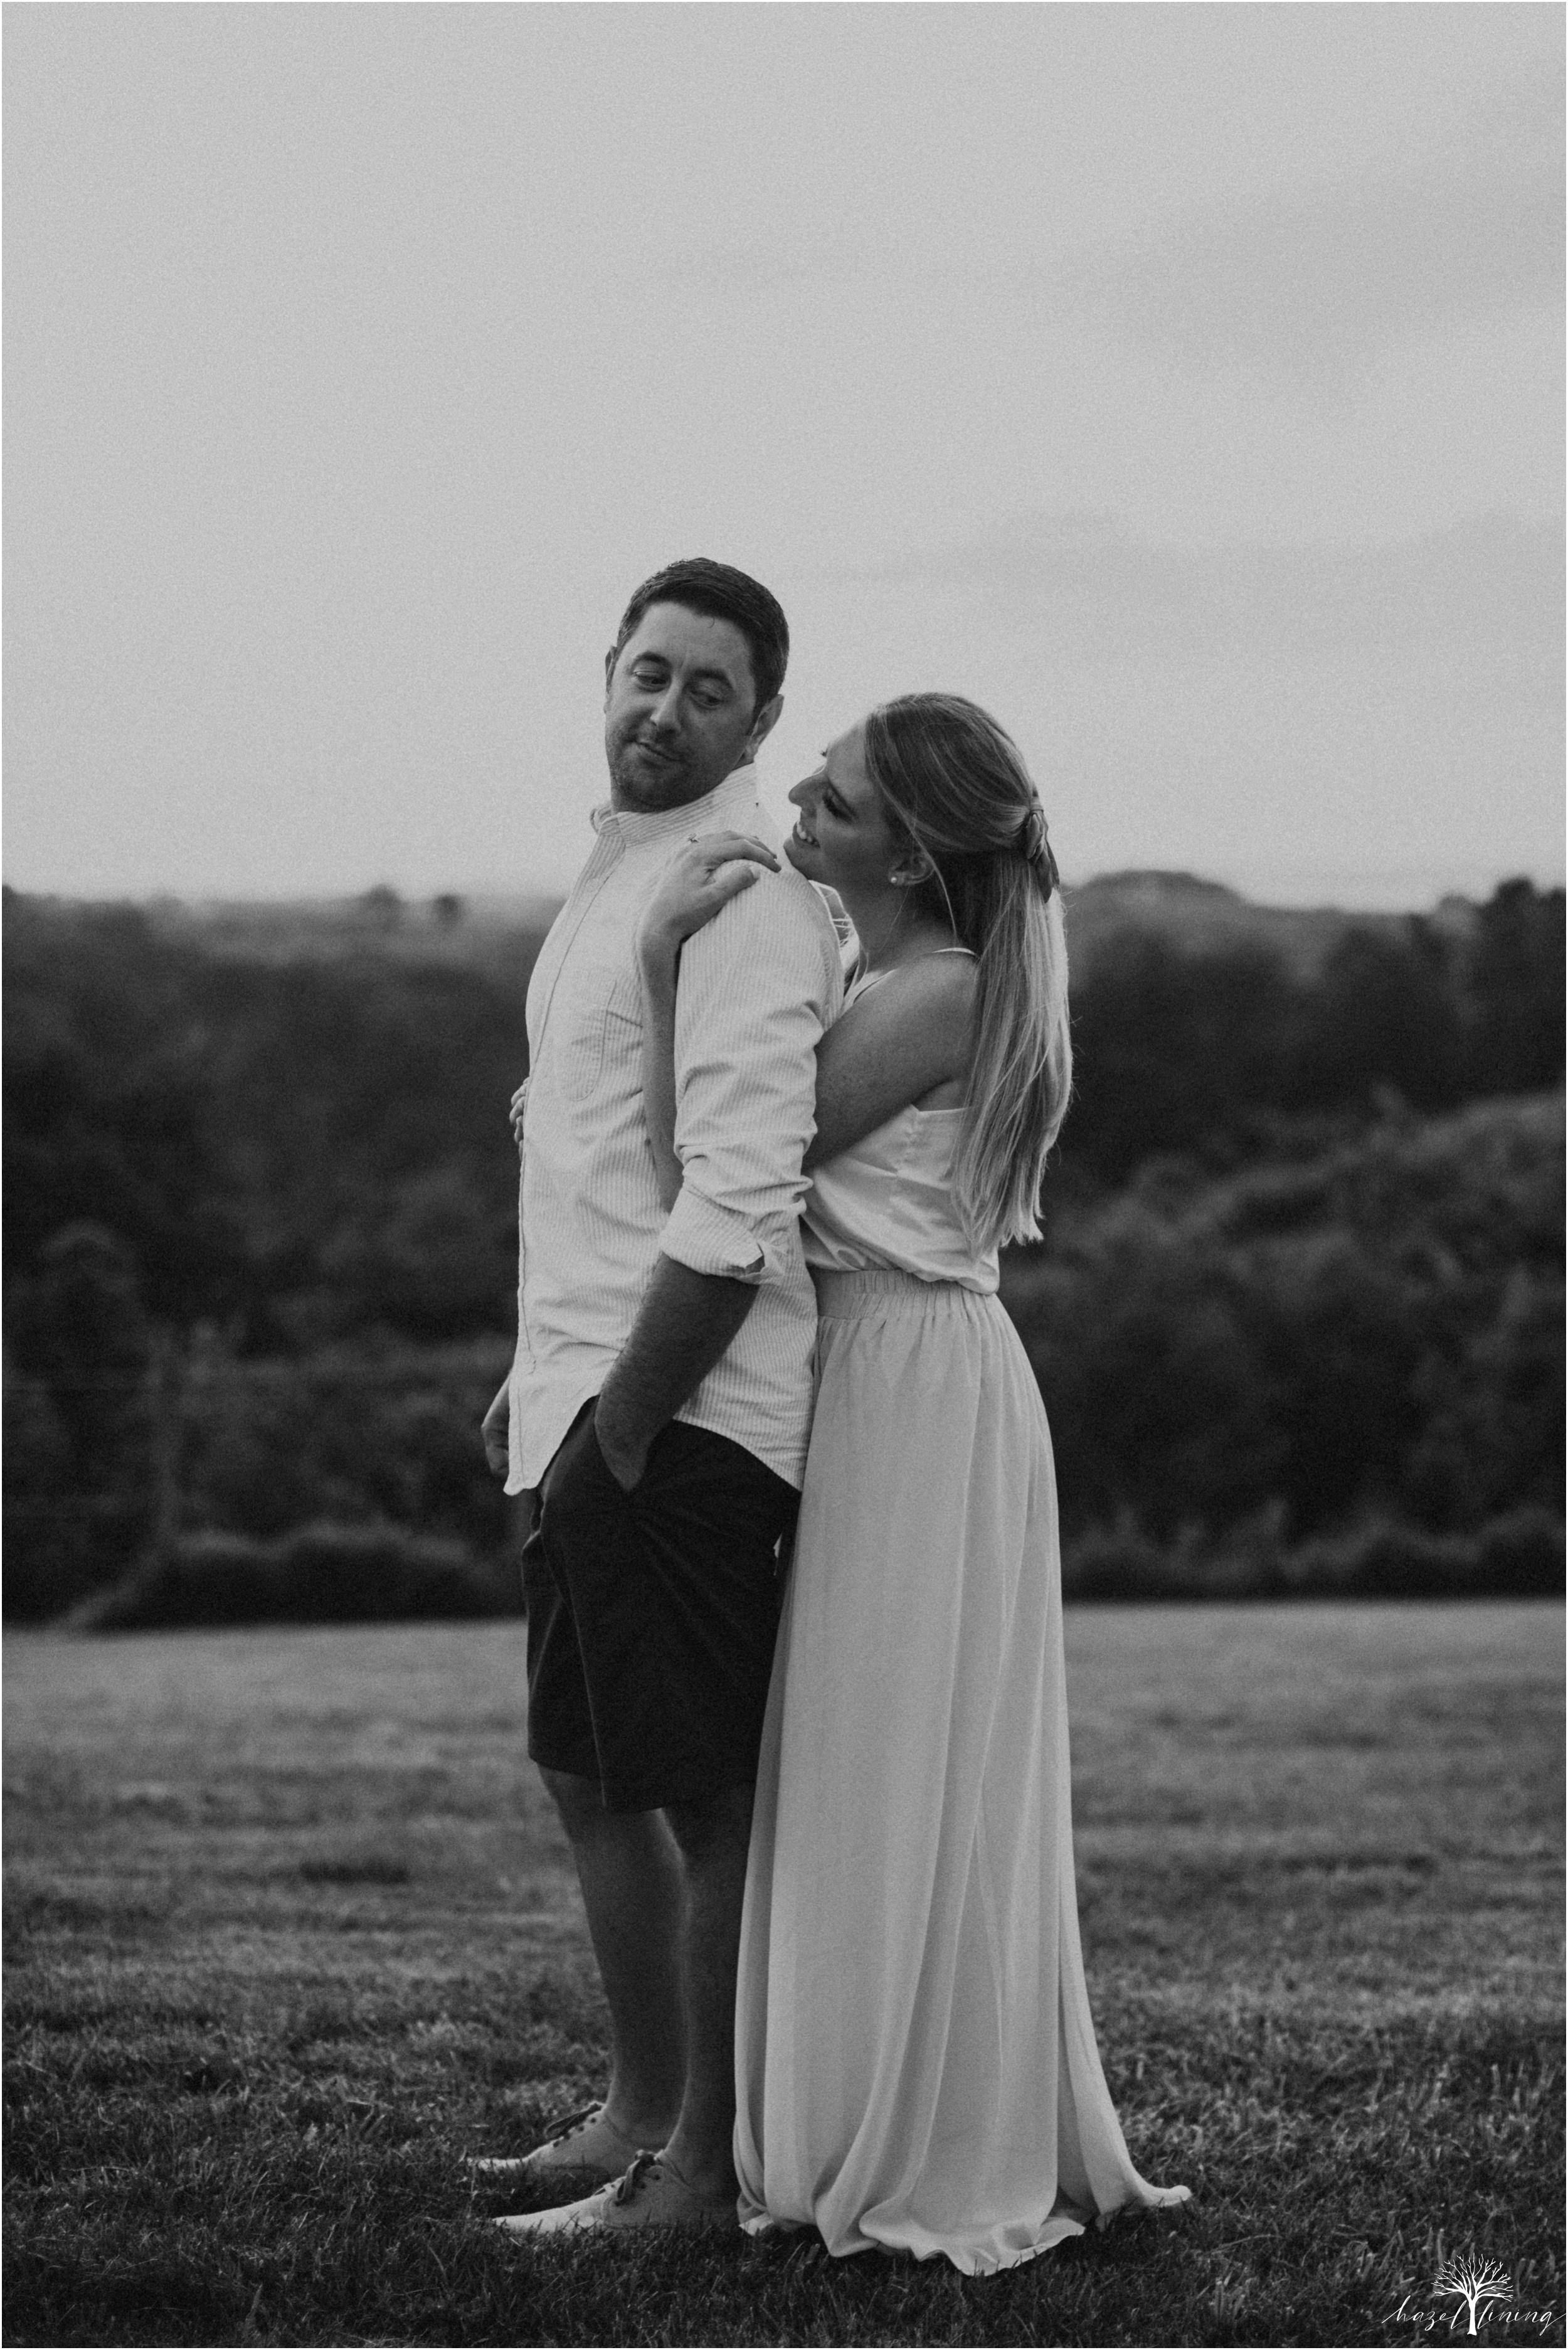 ashley-fillmore-steve-reimer-trexler-nature-preserve-summer-engagement-session-schnecksville-pennsylvania-hazel-lining-photography-destination-elopement-wedding-engagement-photography_0051.jpg